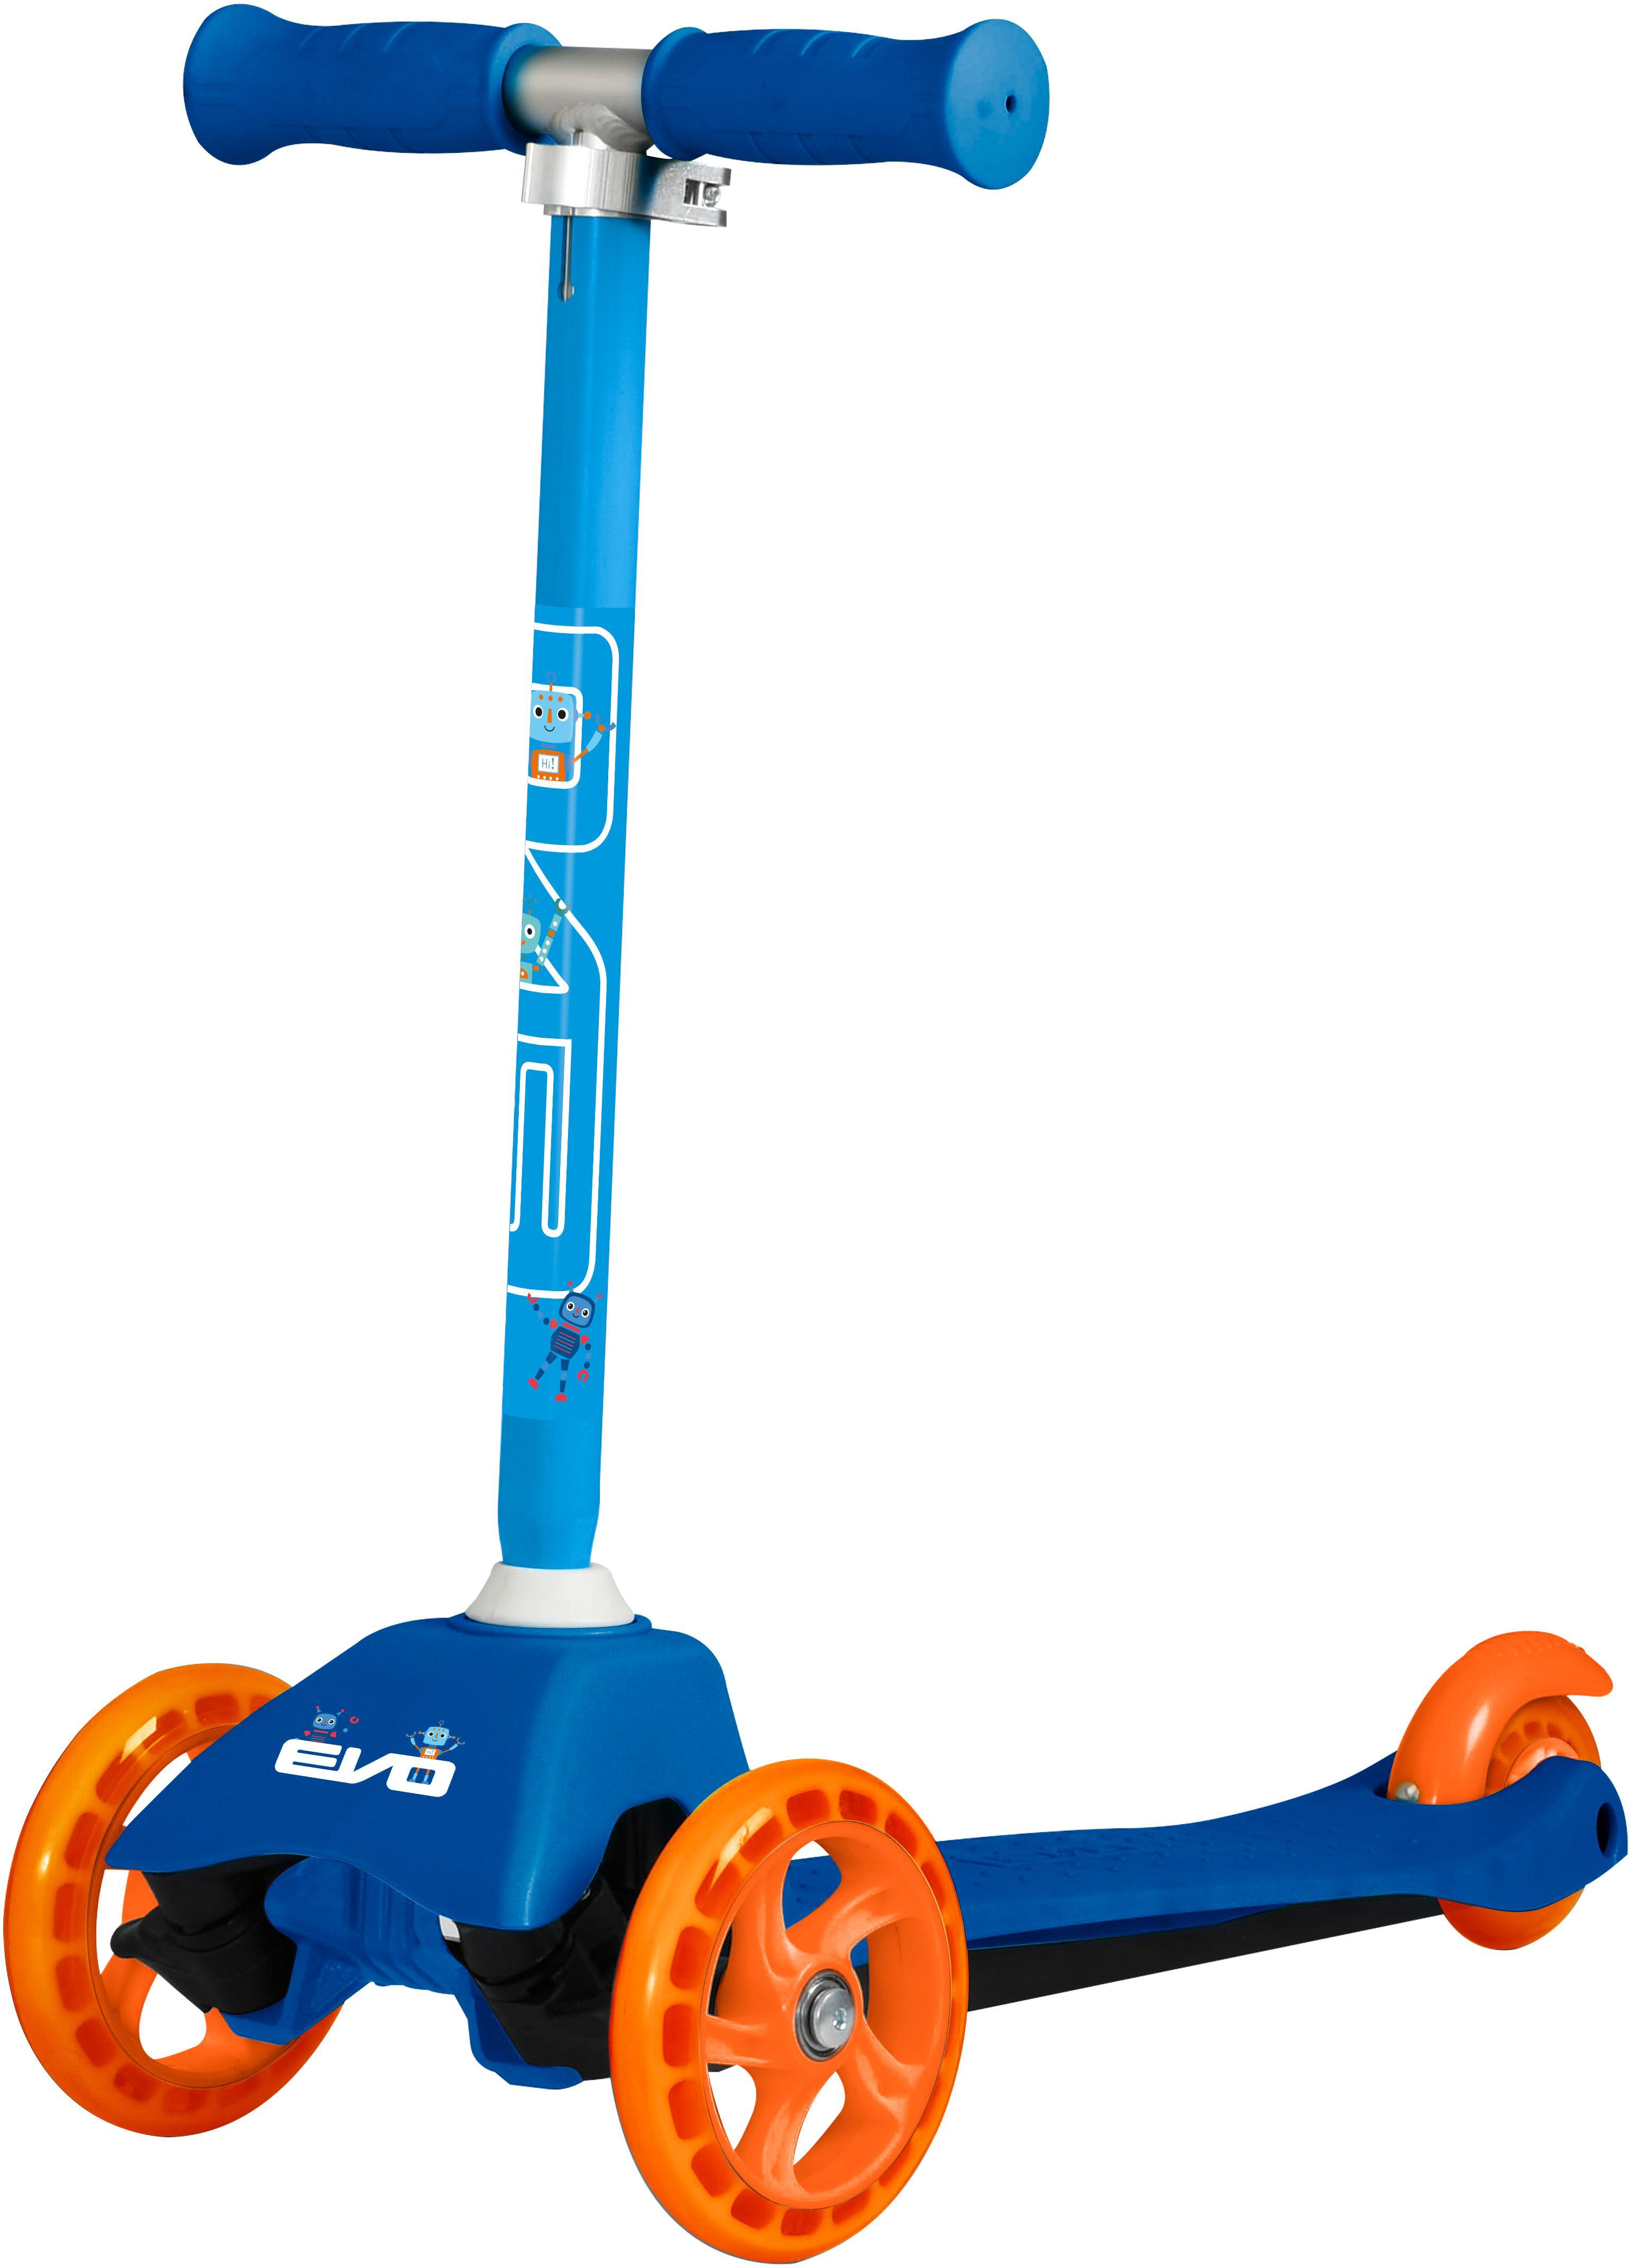 Evo+ Mini Kids Scooter - Blue Robot